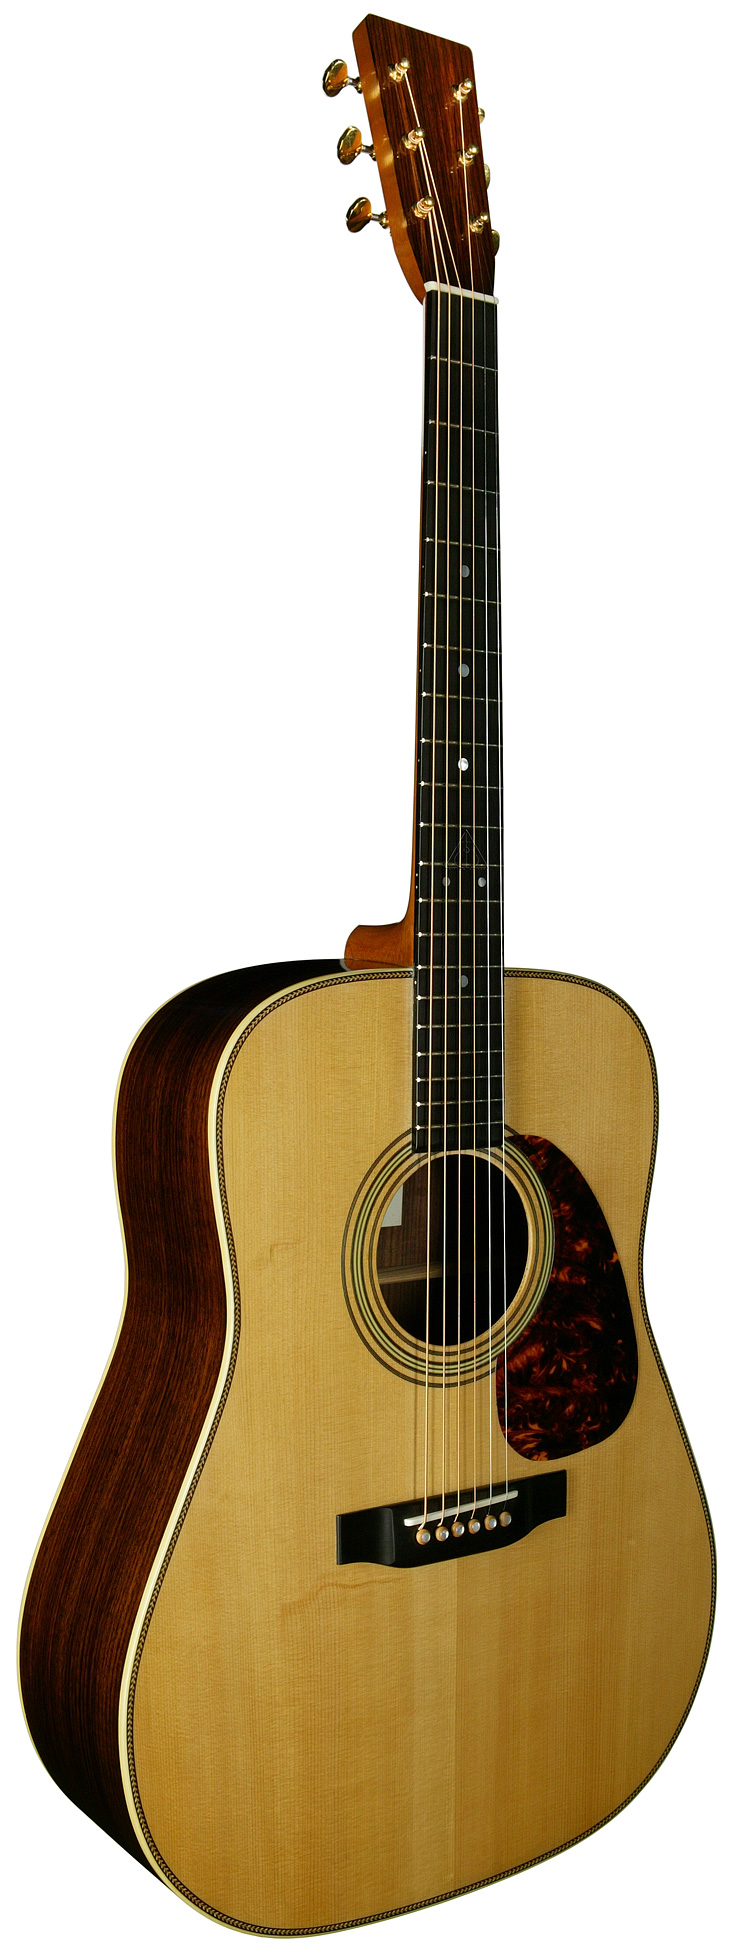 guitar_fa_lg_95.jpg